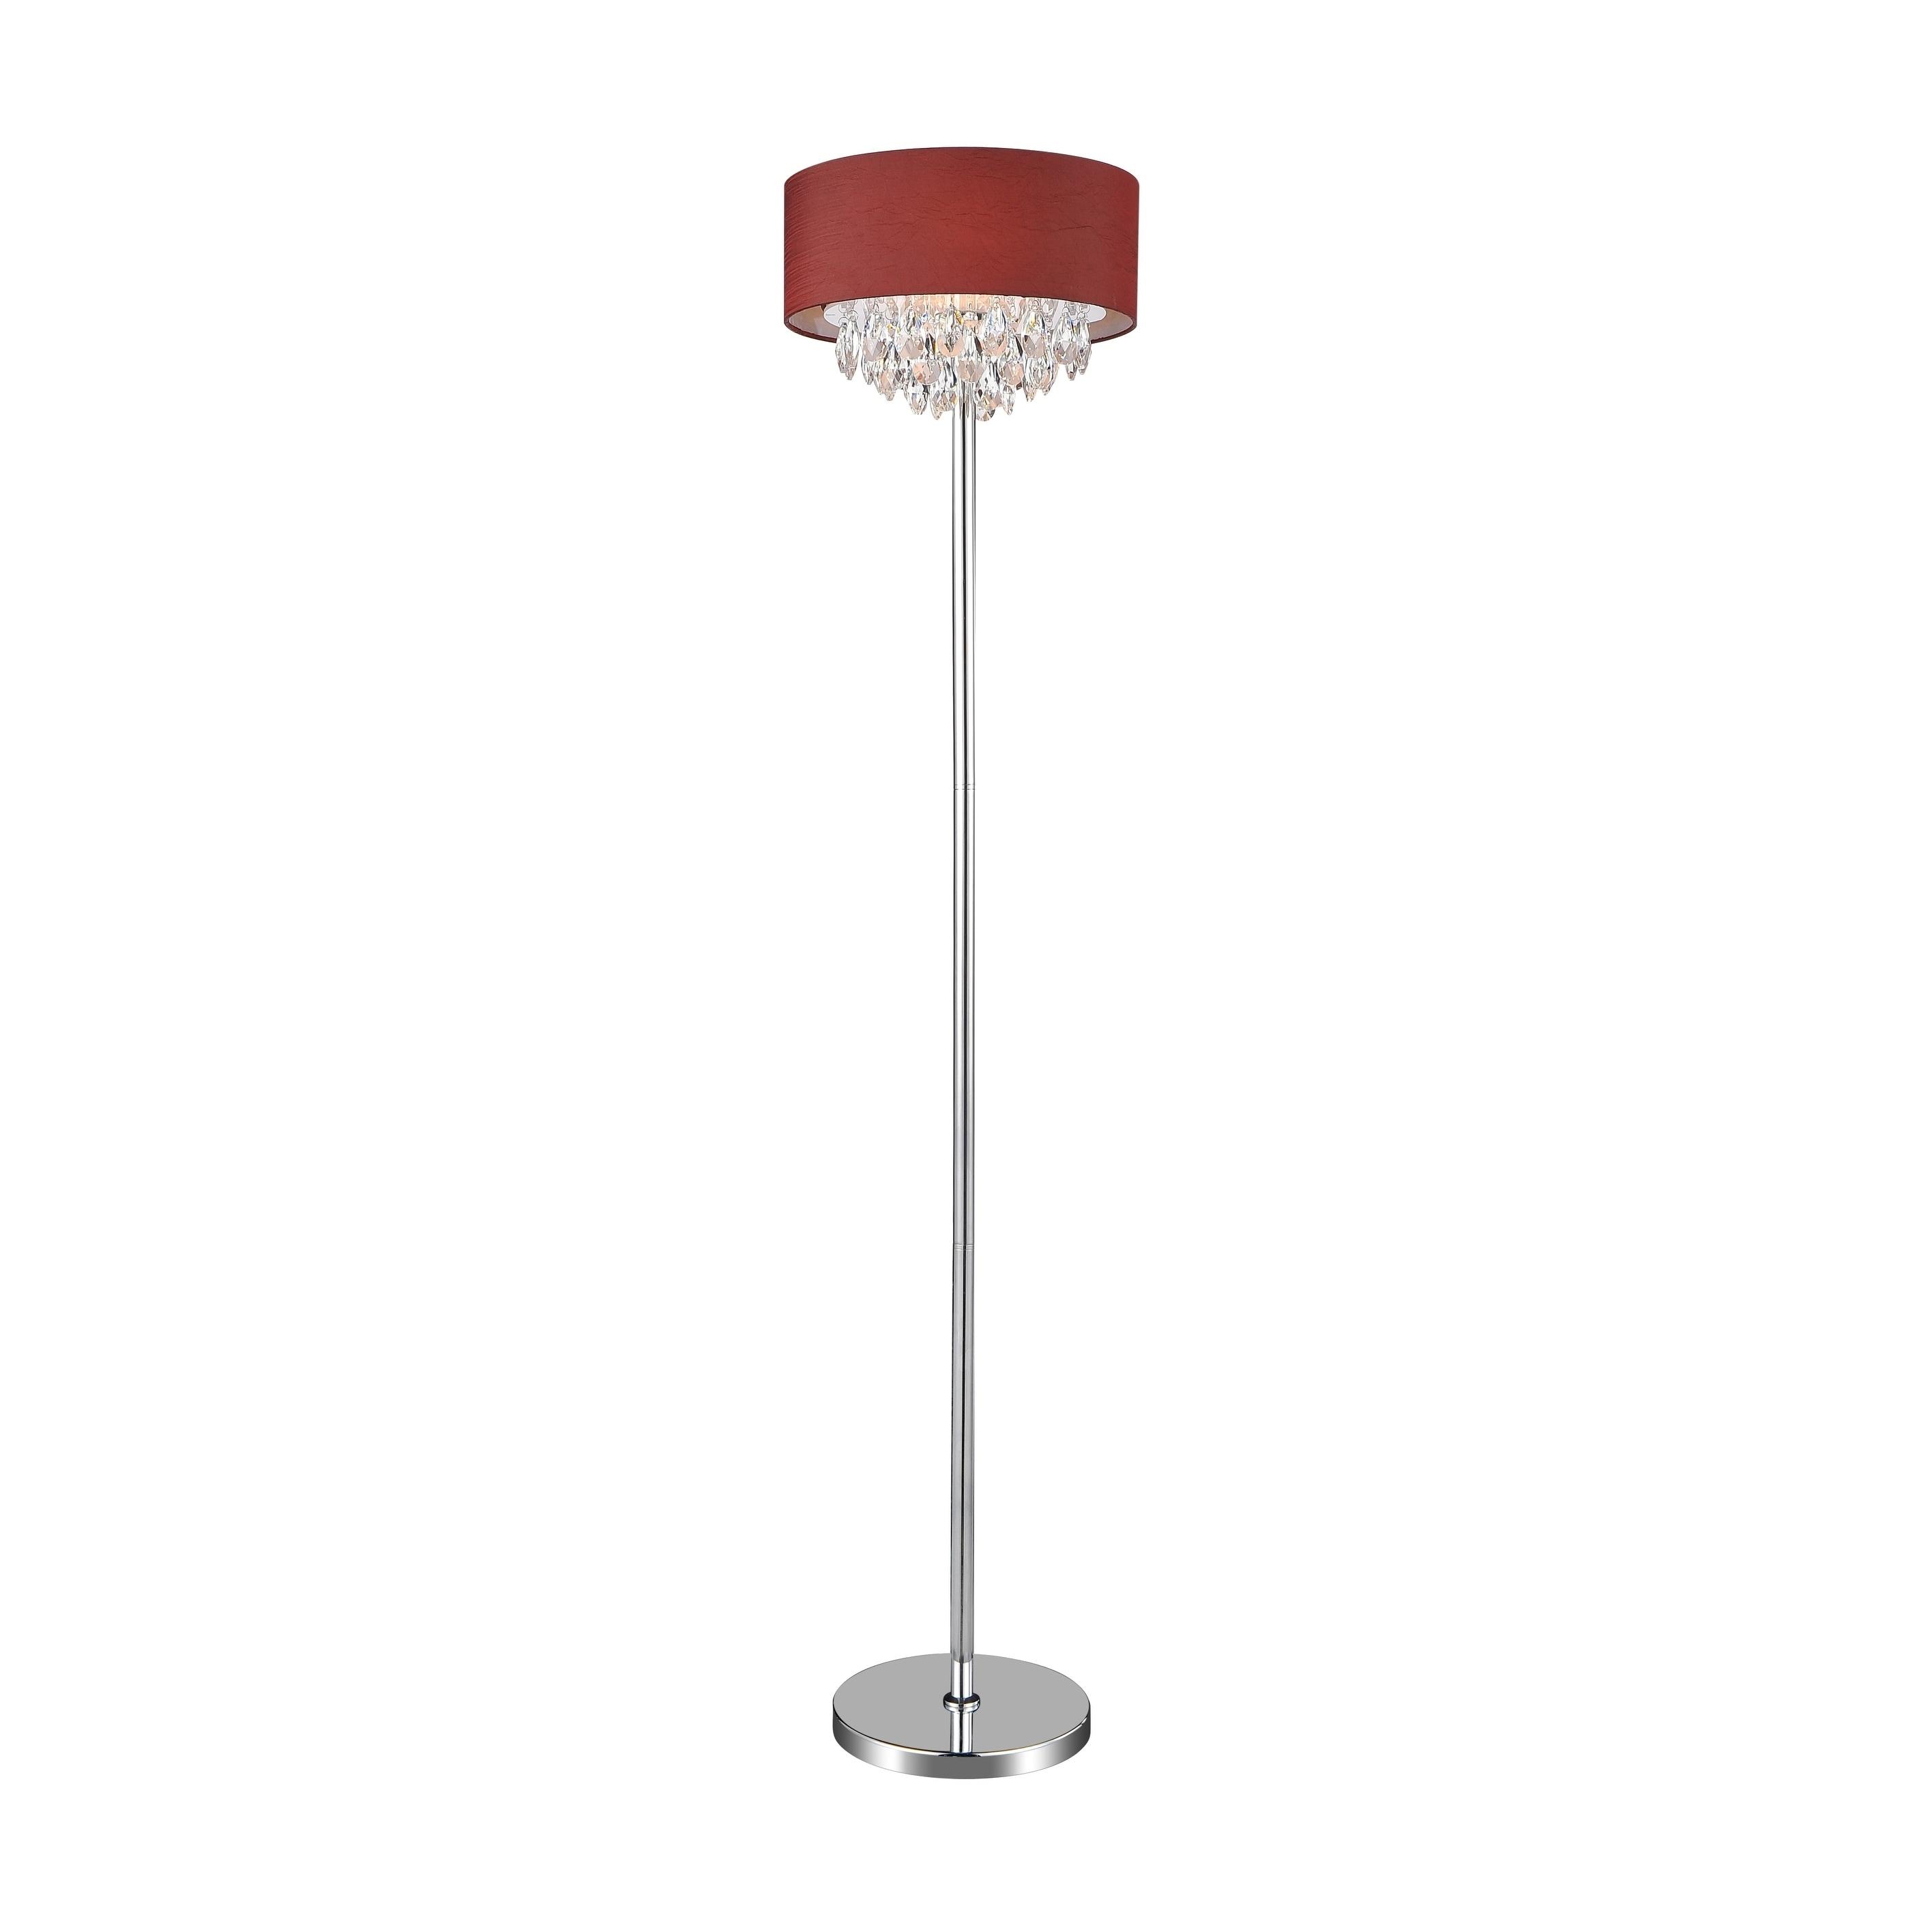 4 Light Floor Lamp With Chrome Finish